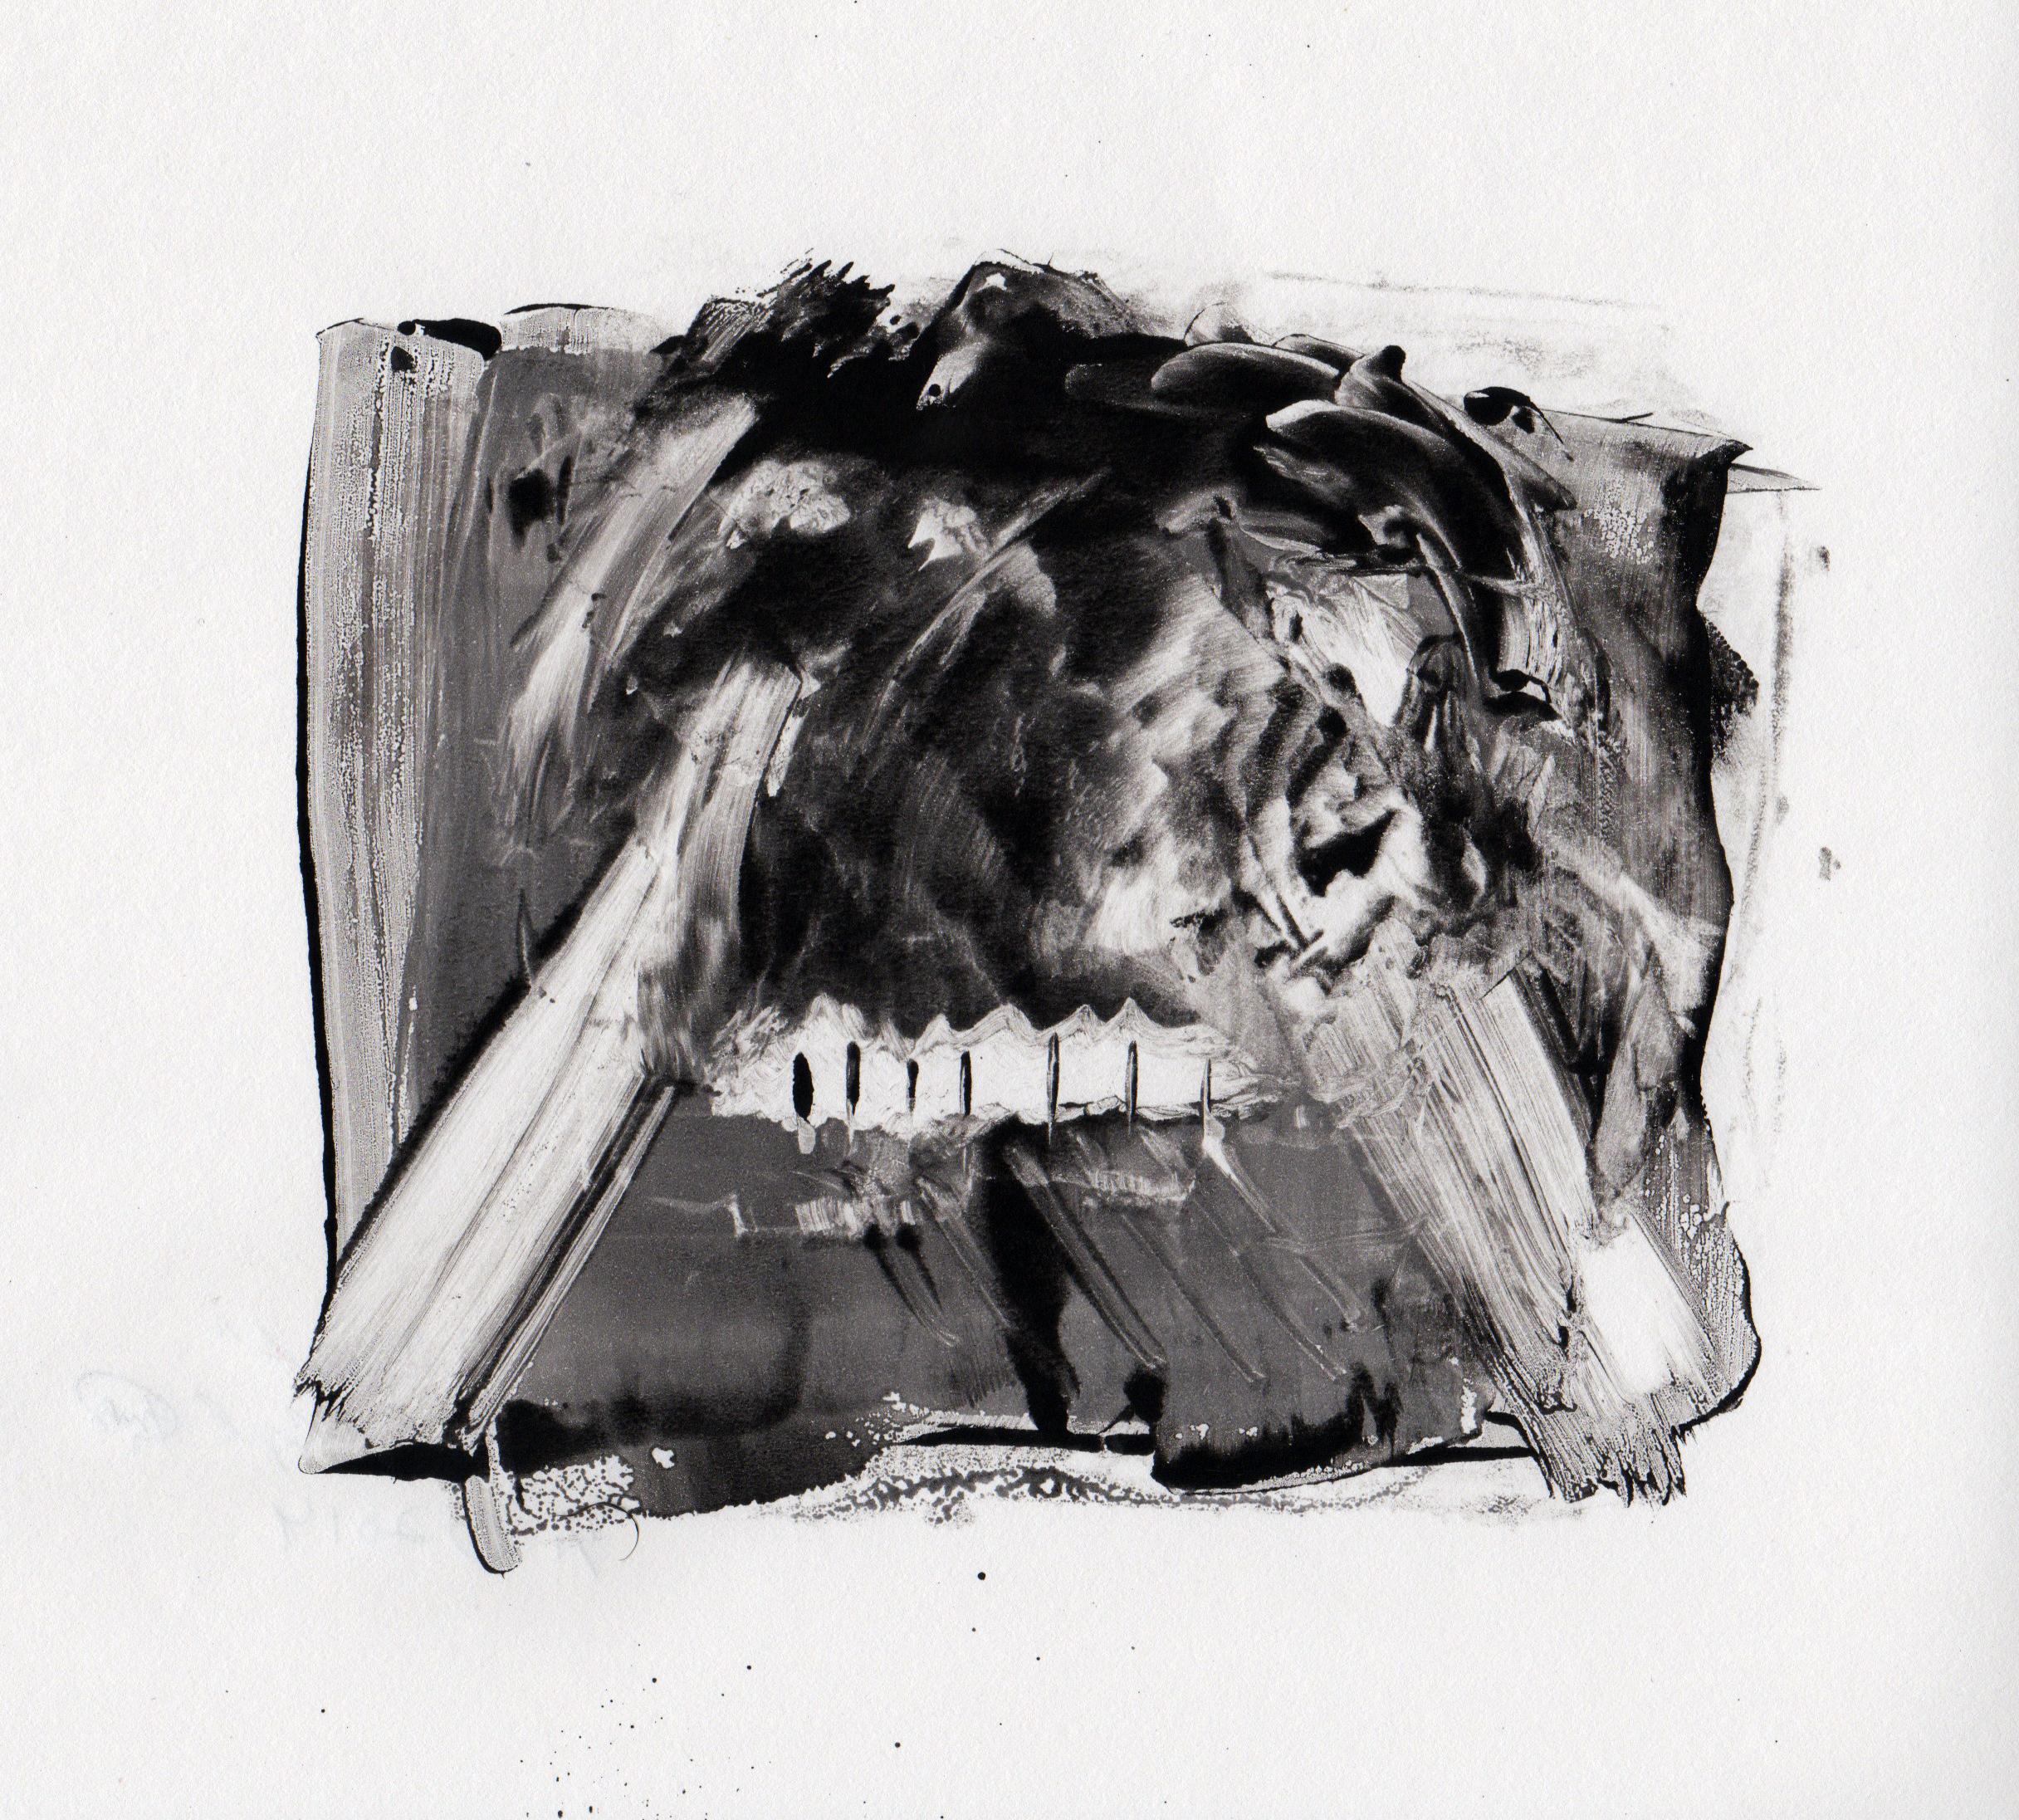 Wild Beast, 2014, gelatin monotype, 10x9 inches